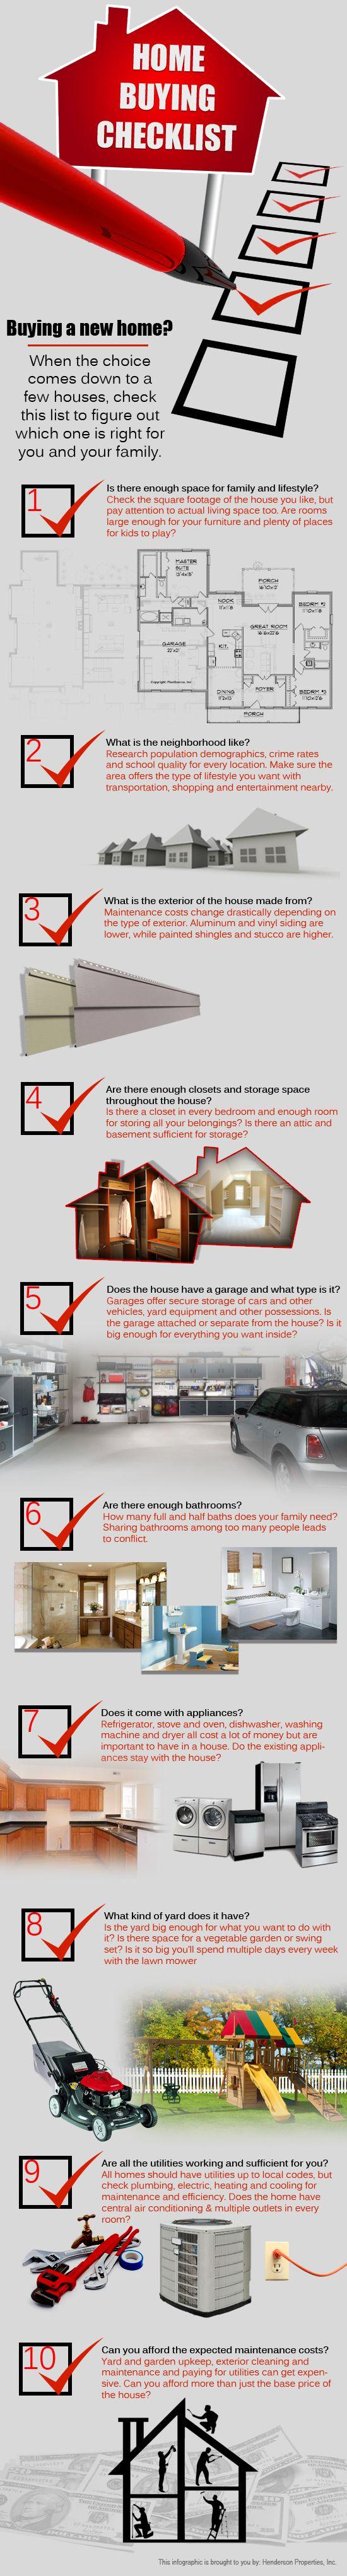 First Time Homebuyer Real Estate Home Listings Hemet San